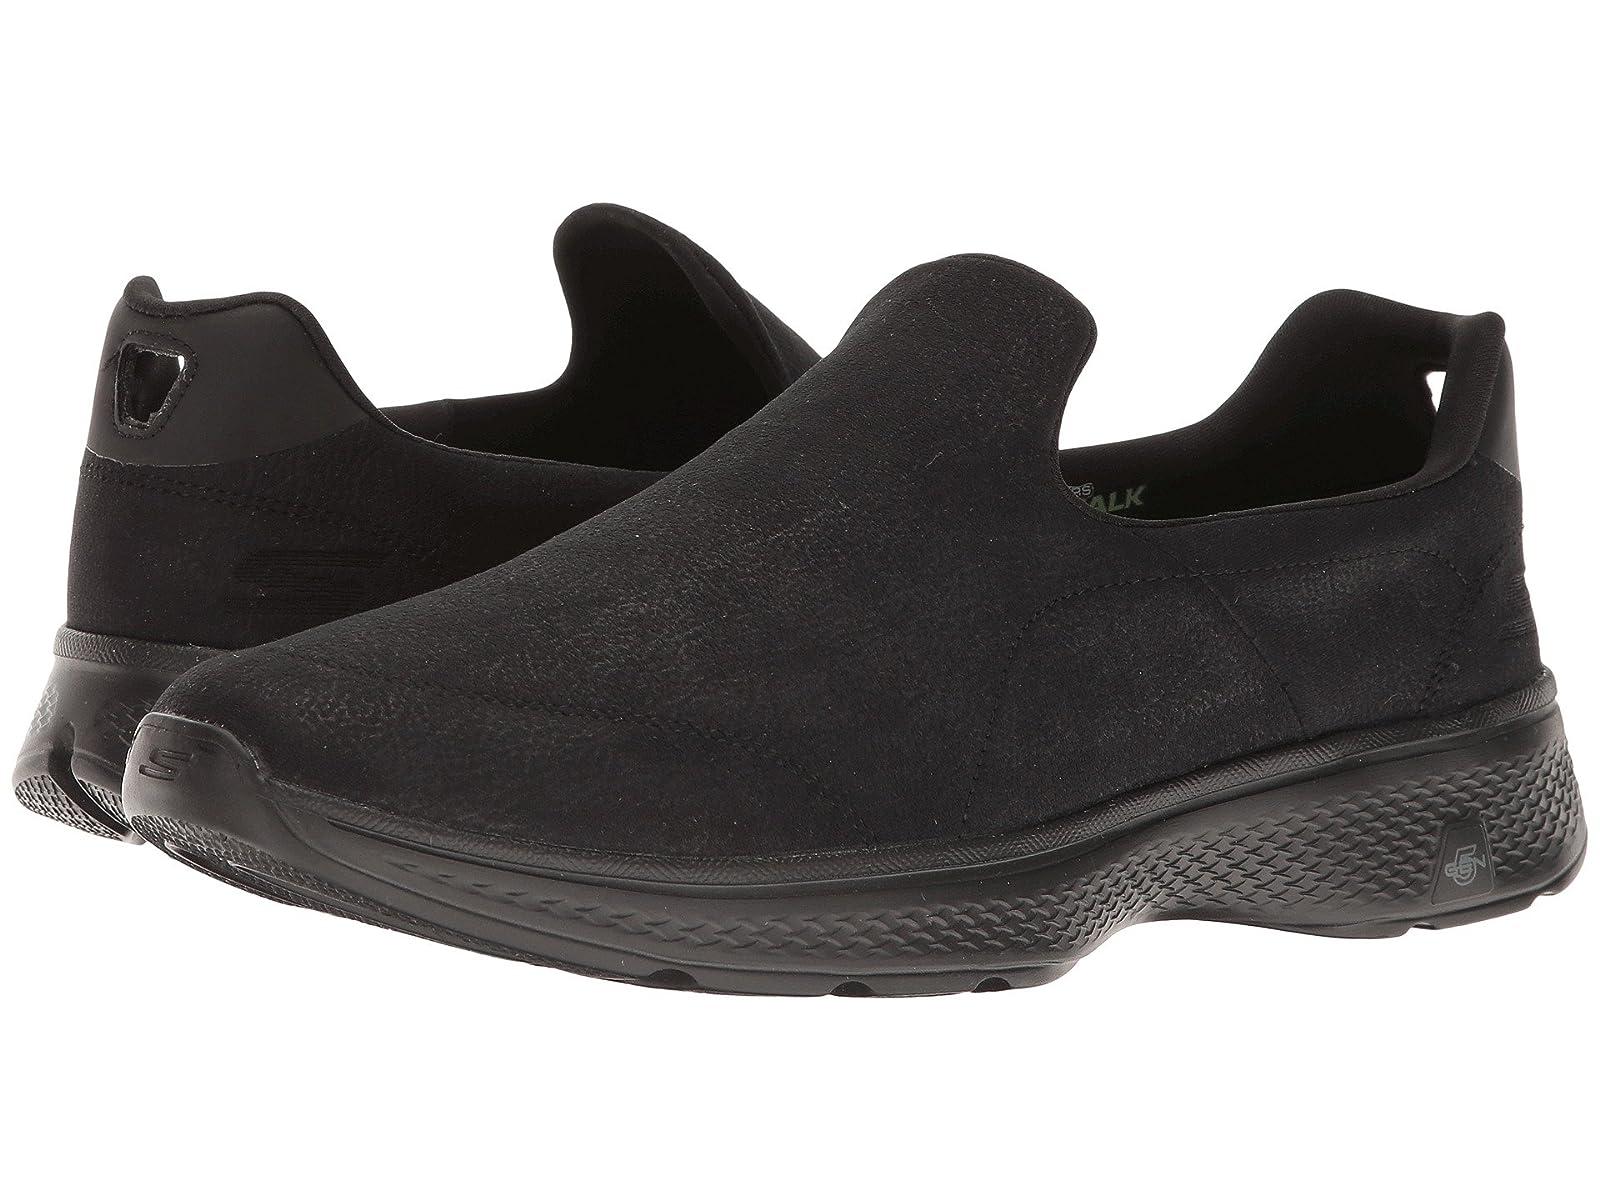 SKECHERS Performance Go Walk 4 - IncredibleCheap and distinctive eye-catching shoes